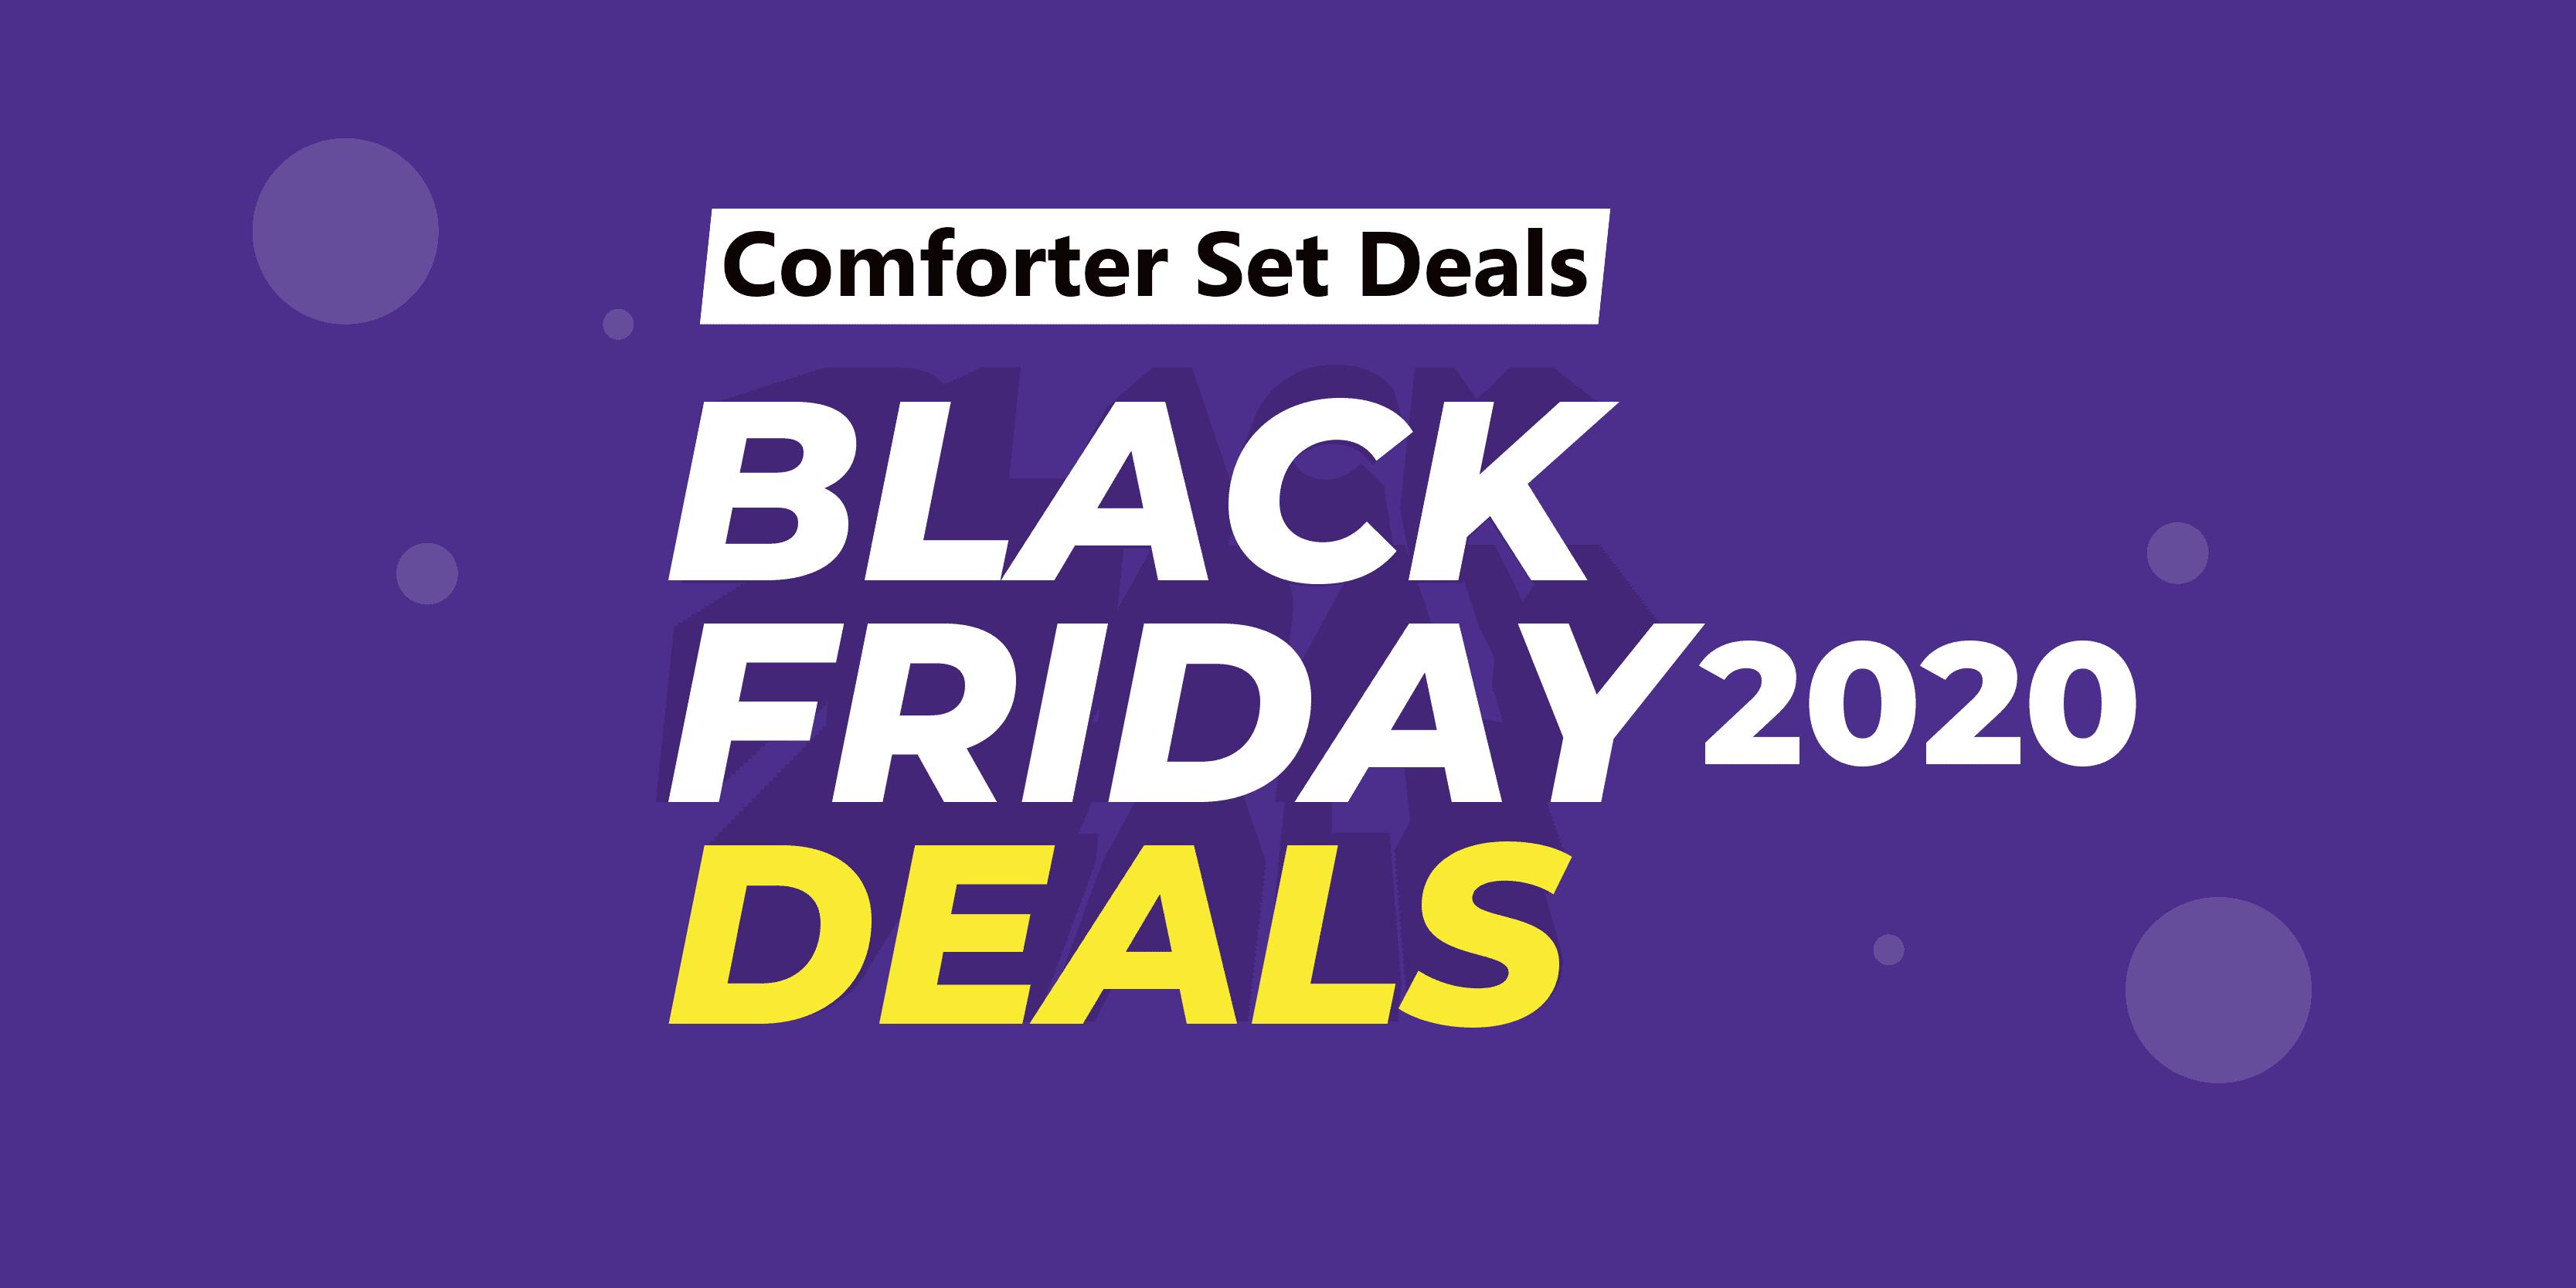 Comforter Set Black Friday Deals (2020) On Amazon